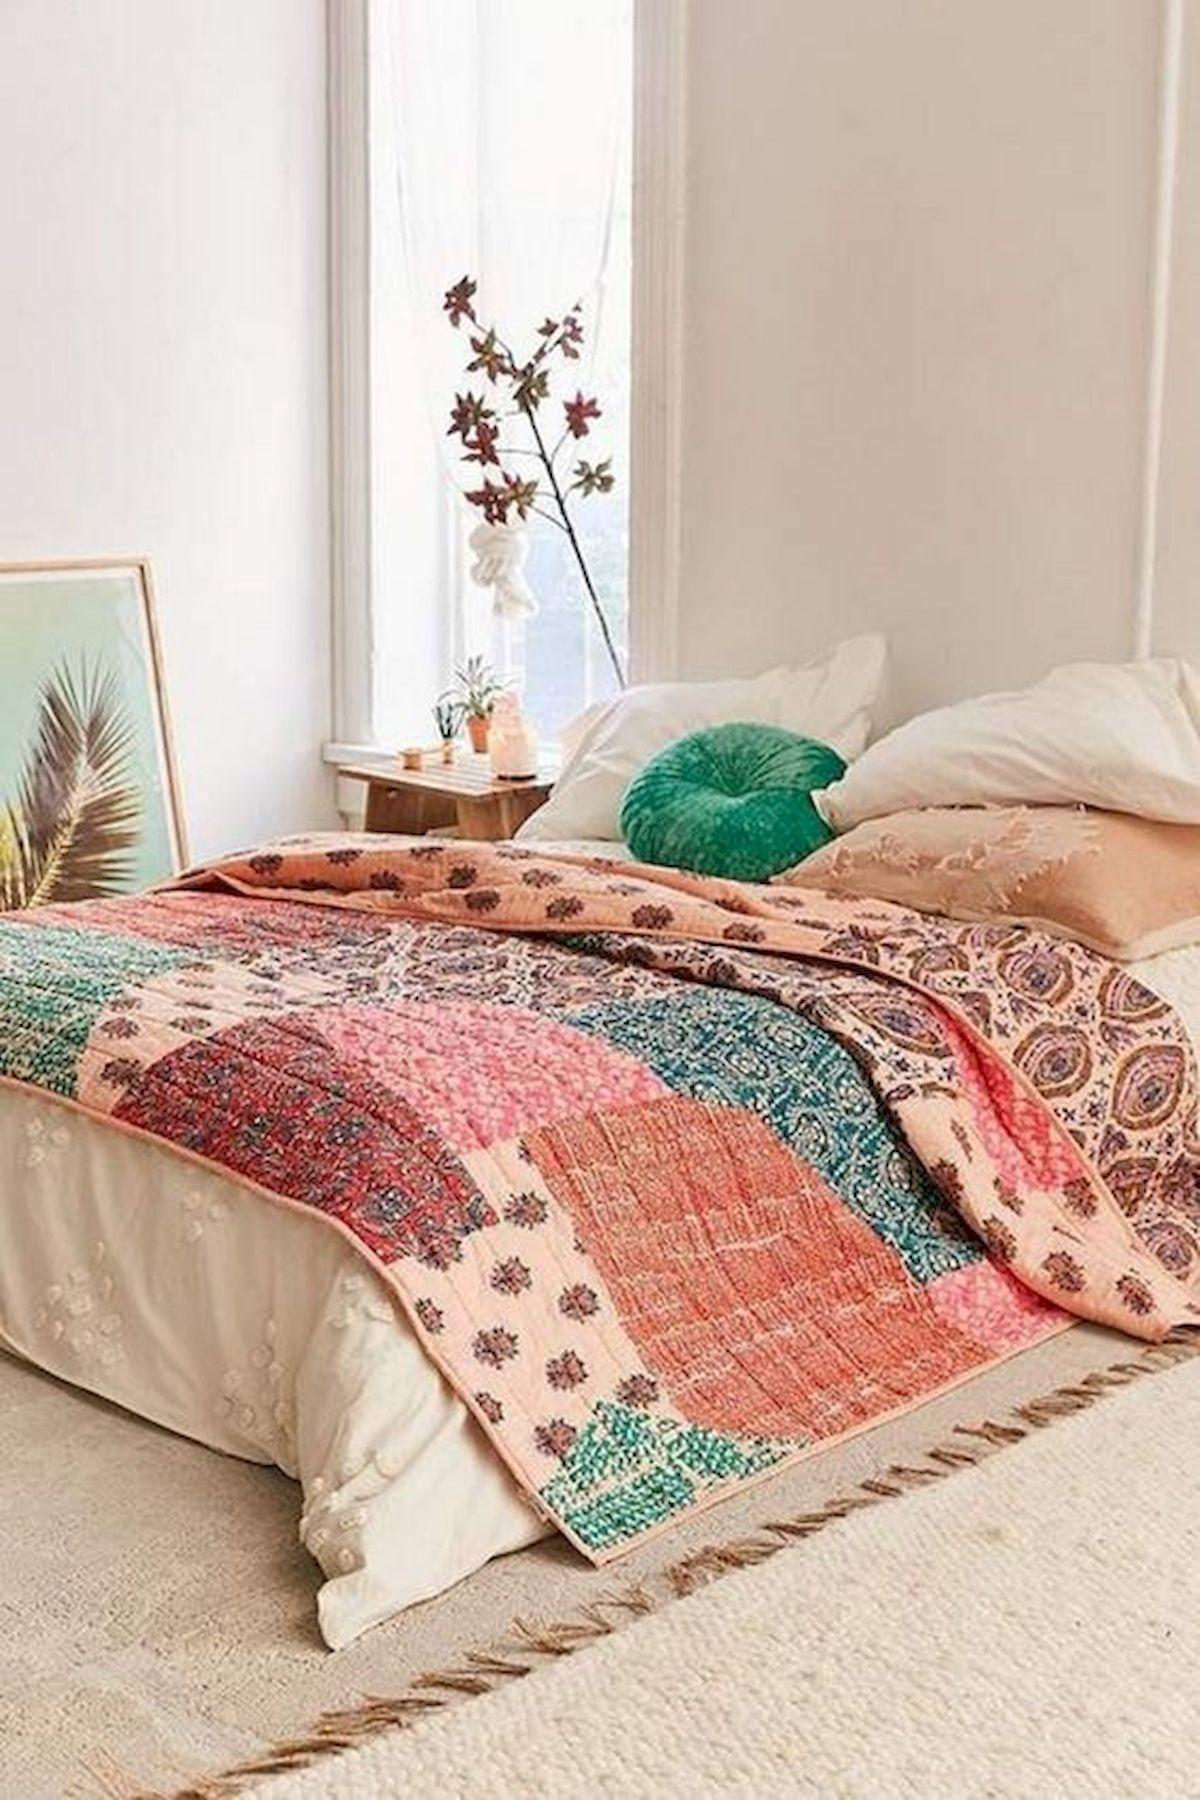 40 Fantastic DIY Decor Ideas For Farmhouse Boho Bedroom Design (40)